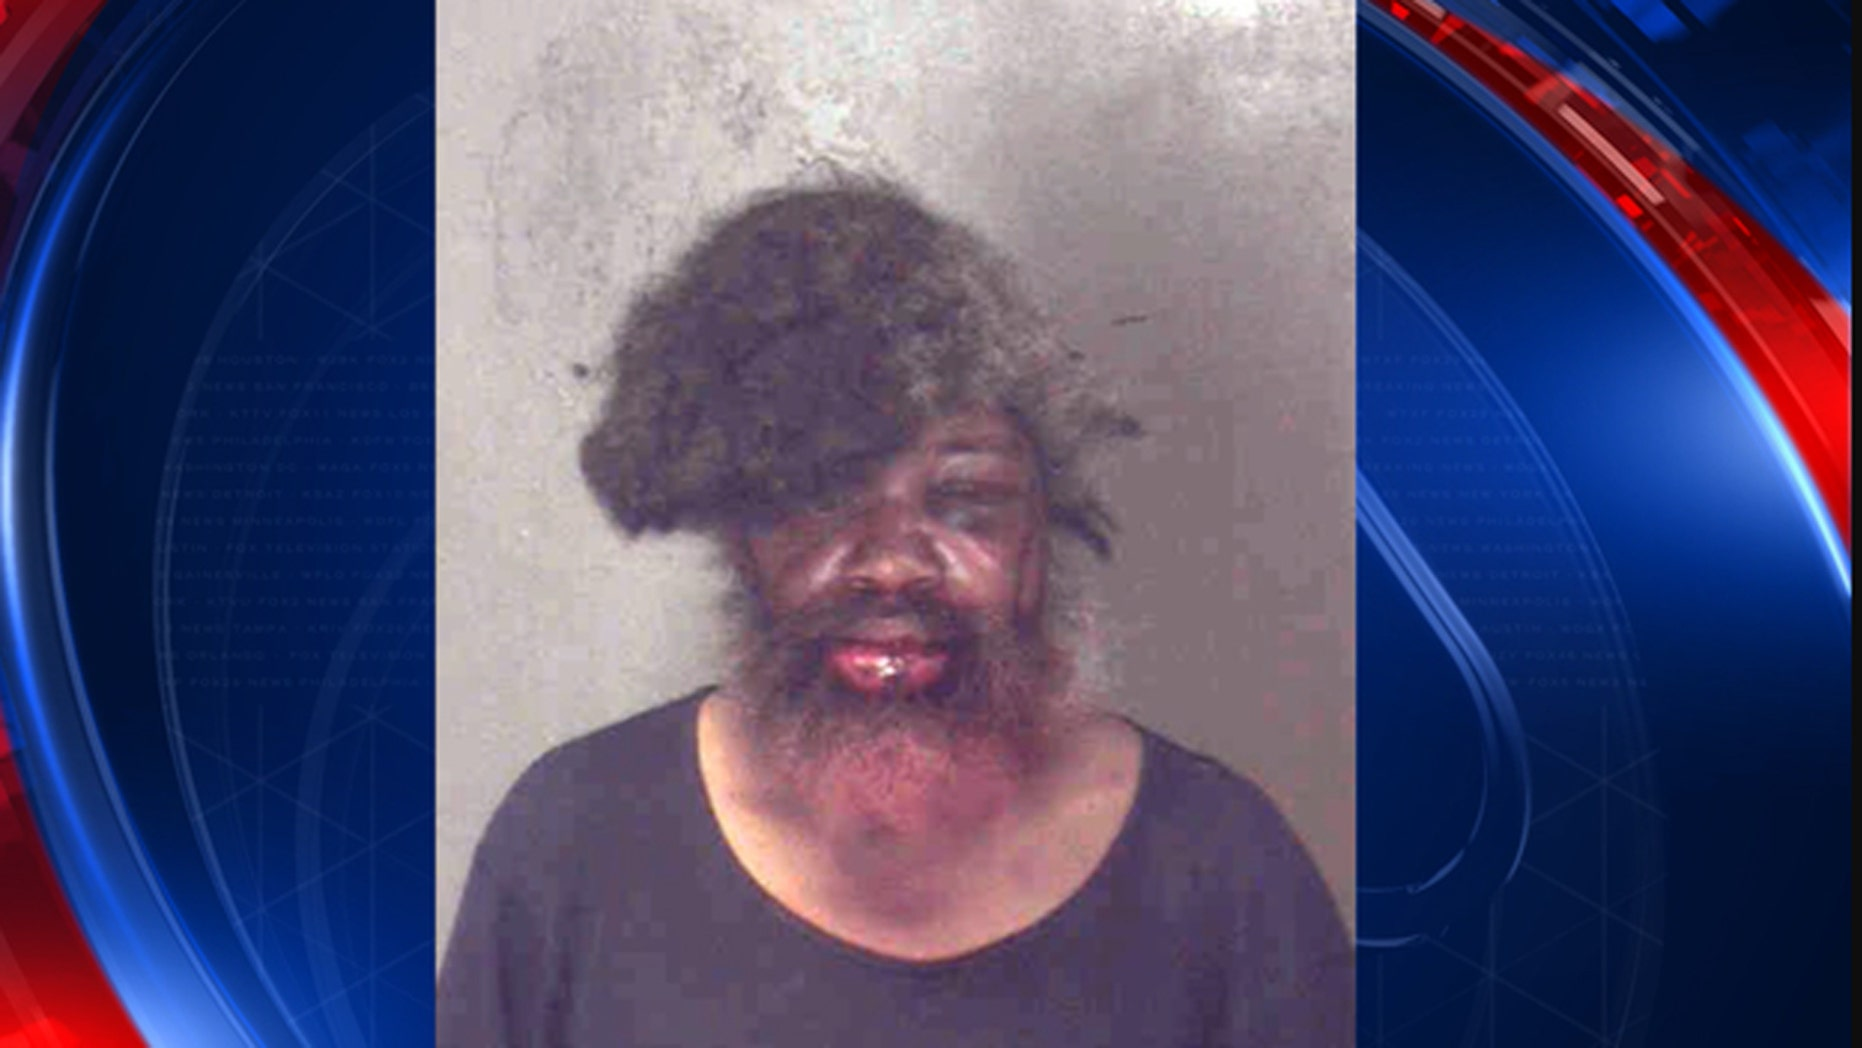 Police say Sydrick Heard, 61, tried to kidnap a child at an Atlanta park.